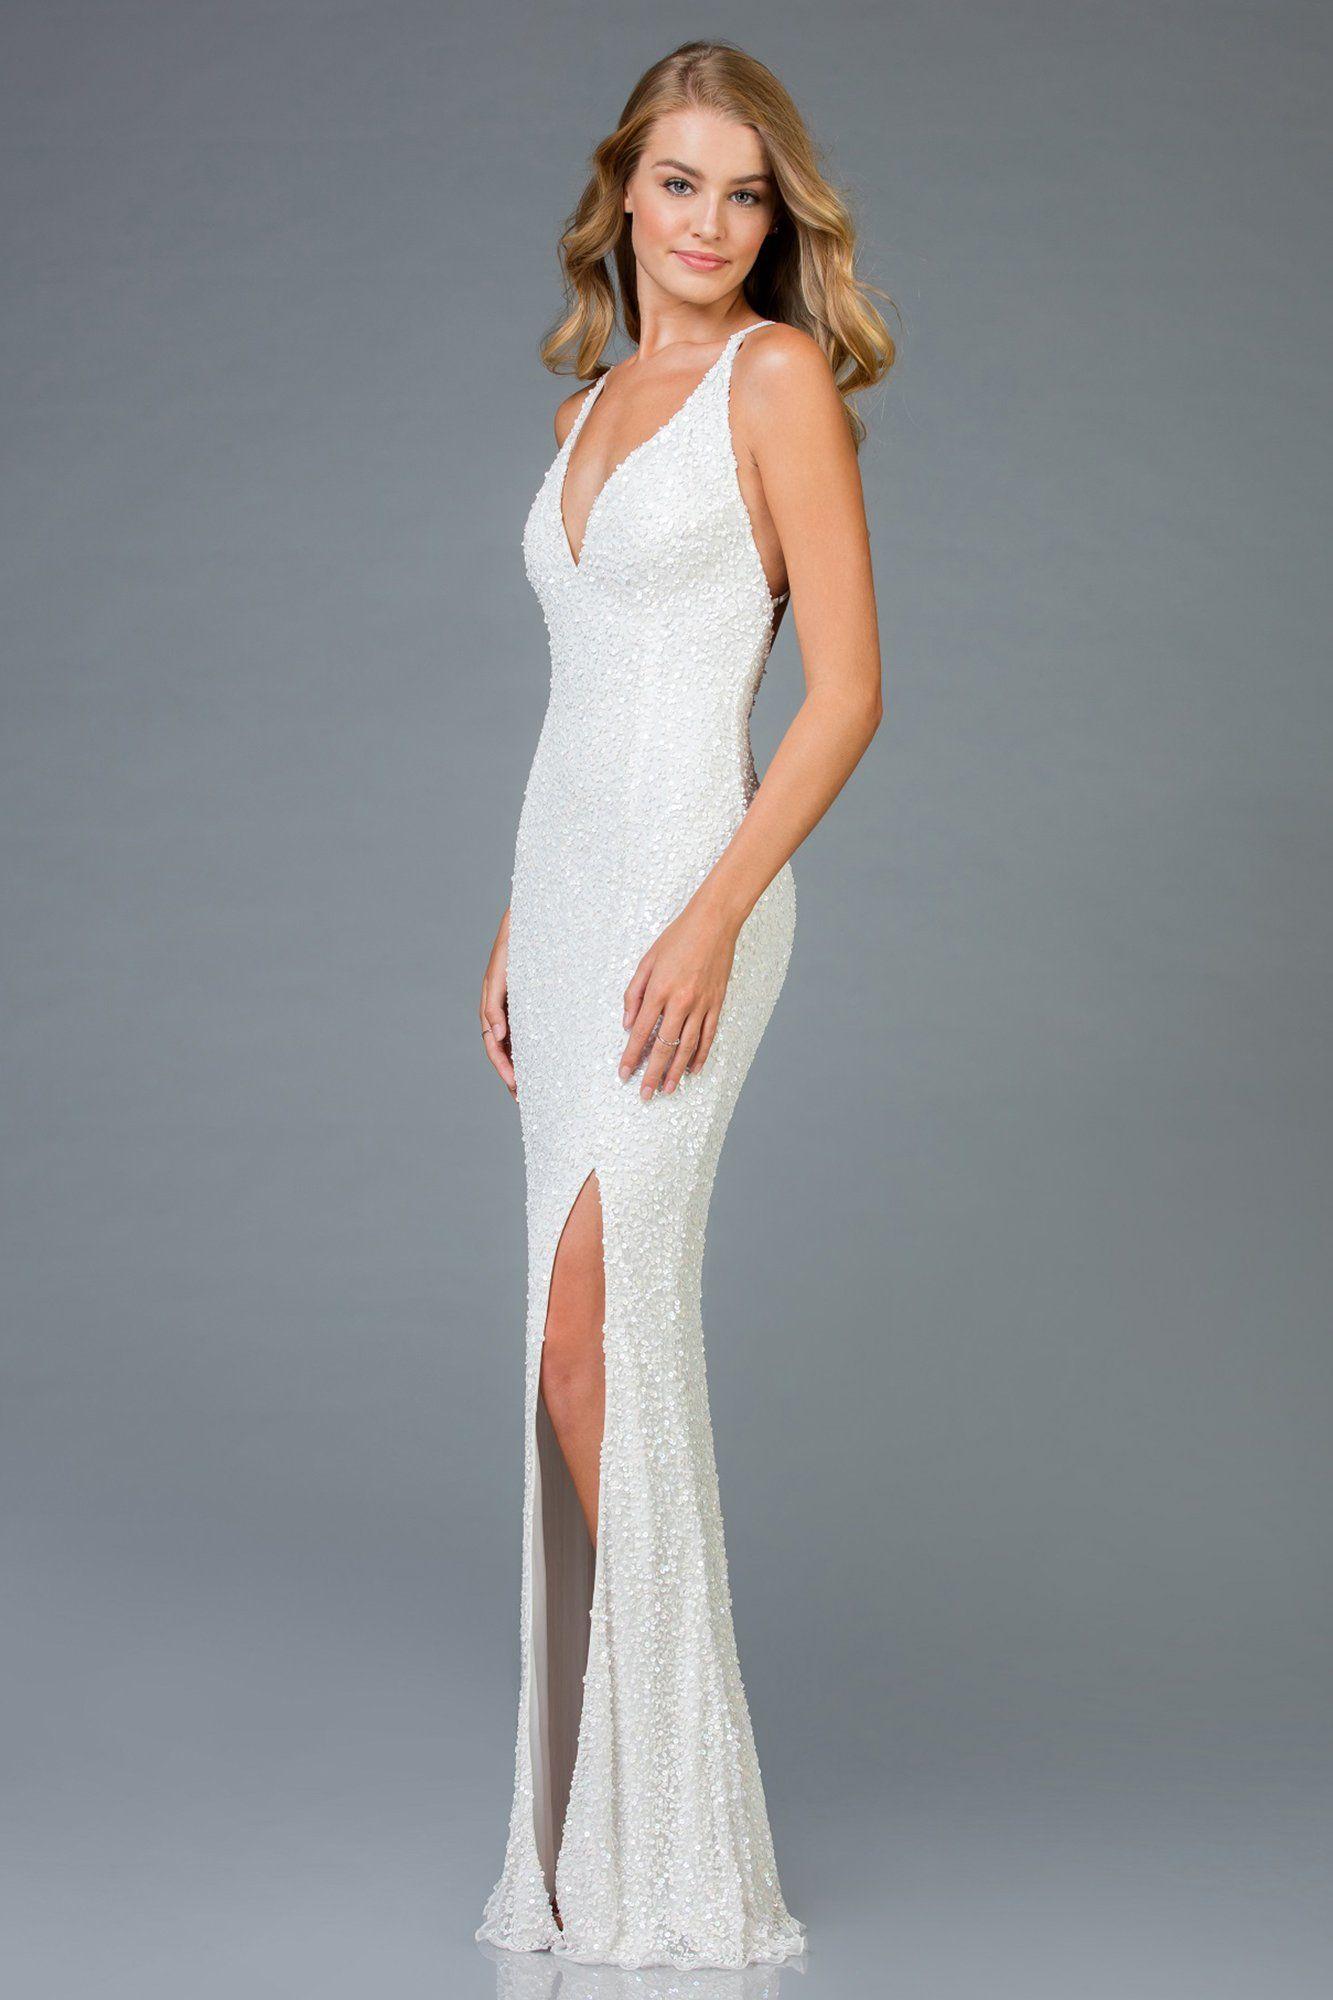 Scala 48949 Sequined Plunging Halter V Neck Sheath Dress White Sparkly Dress White Prom Dress Long White Prom Dress [ 2000 x 1333 Pixel ]